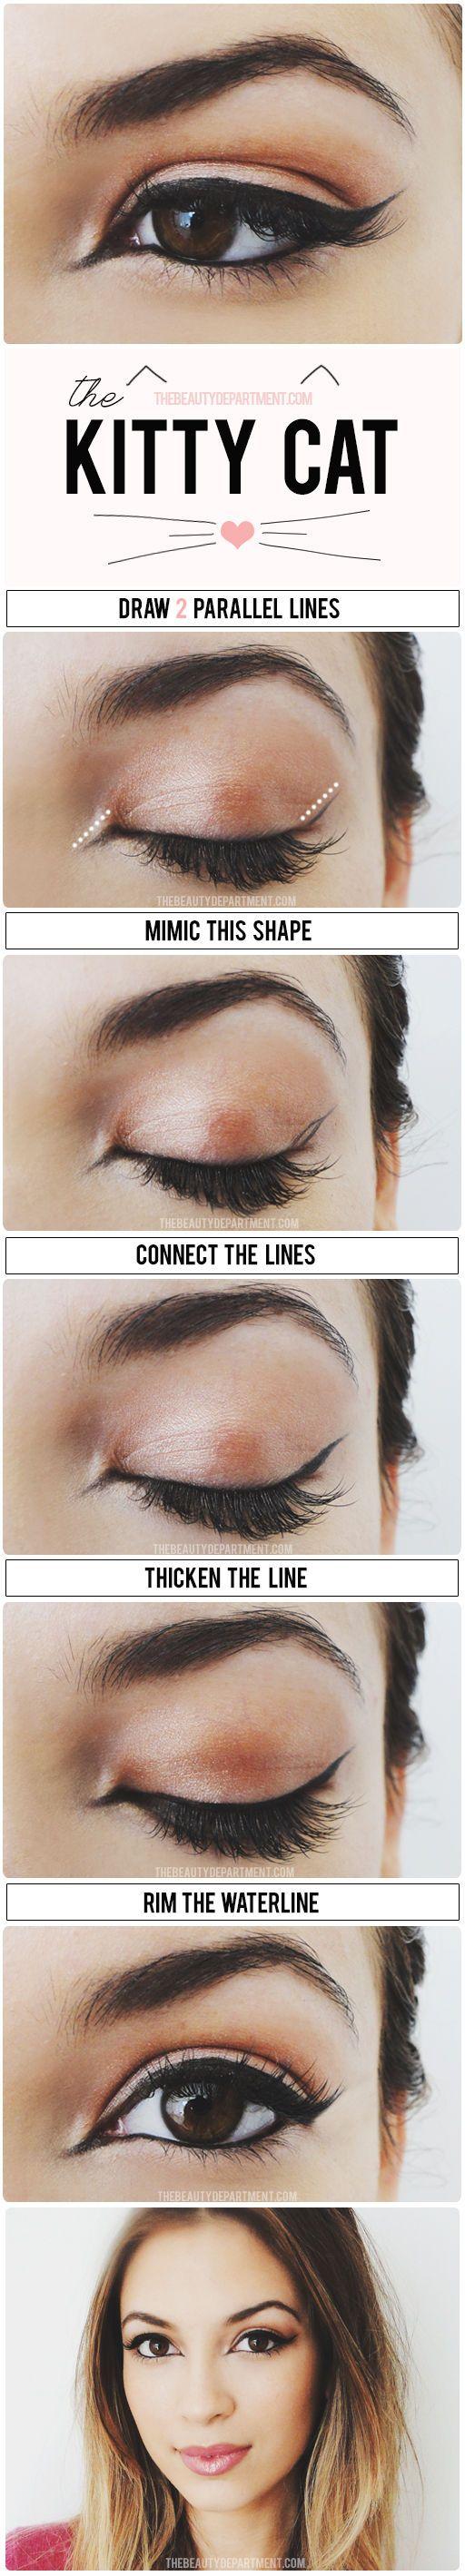 Kitty Eye Makeup